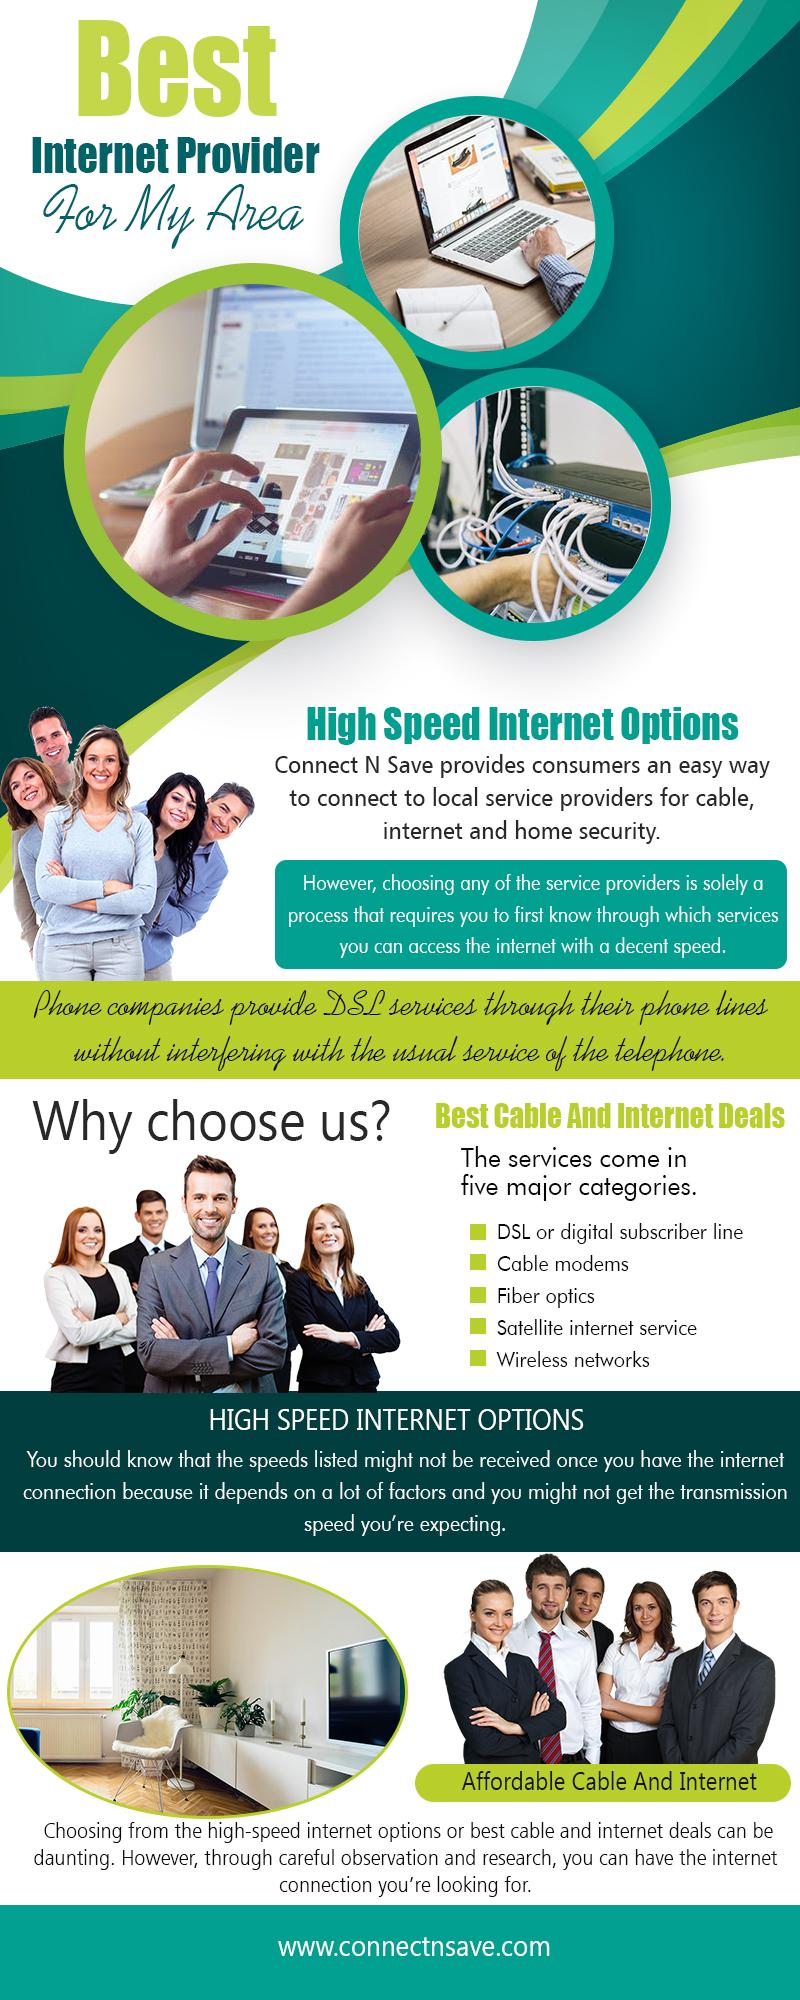 Best Internet Provider